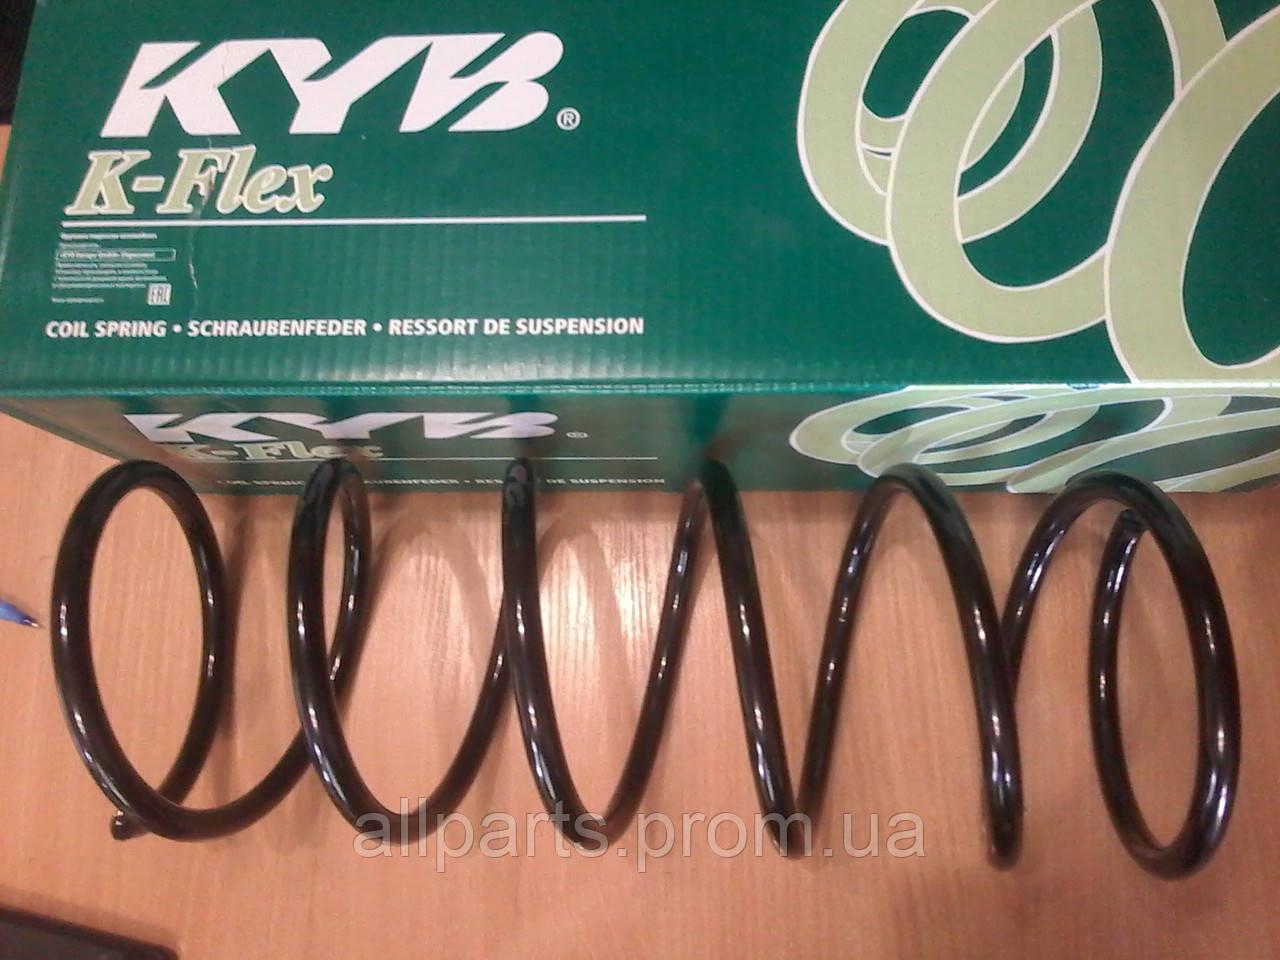 Пружины K-Flex производителя KYB (Каяба)